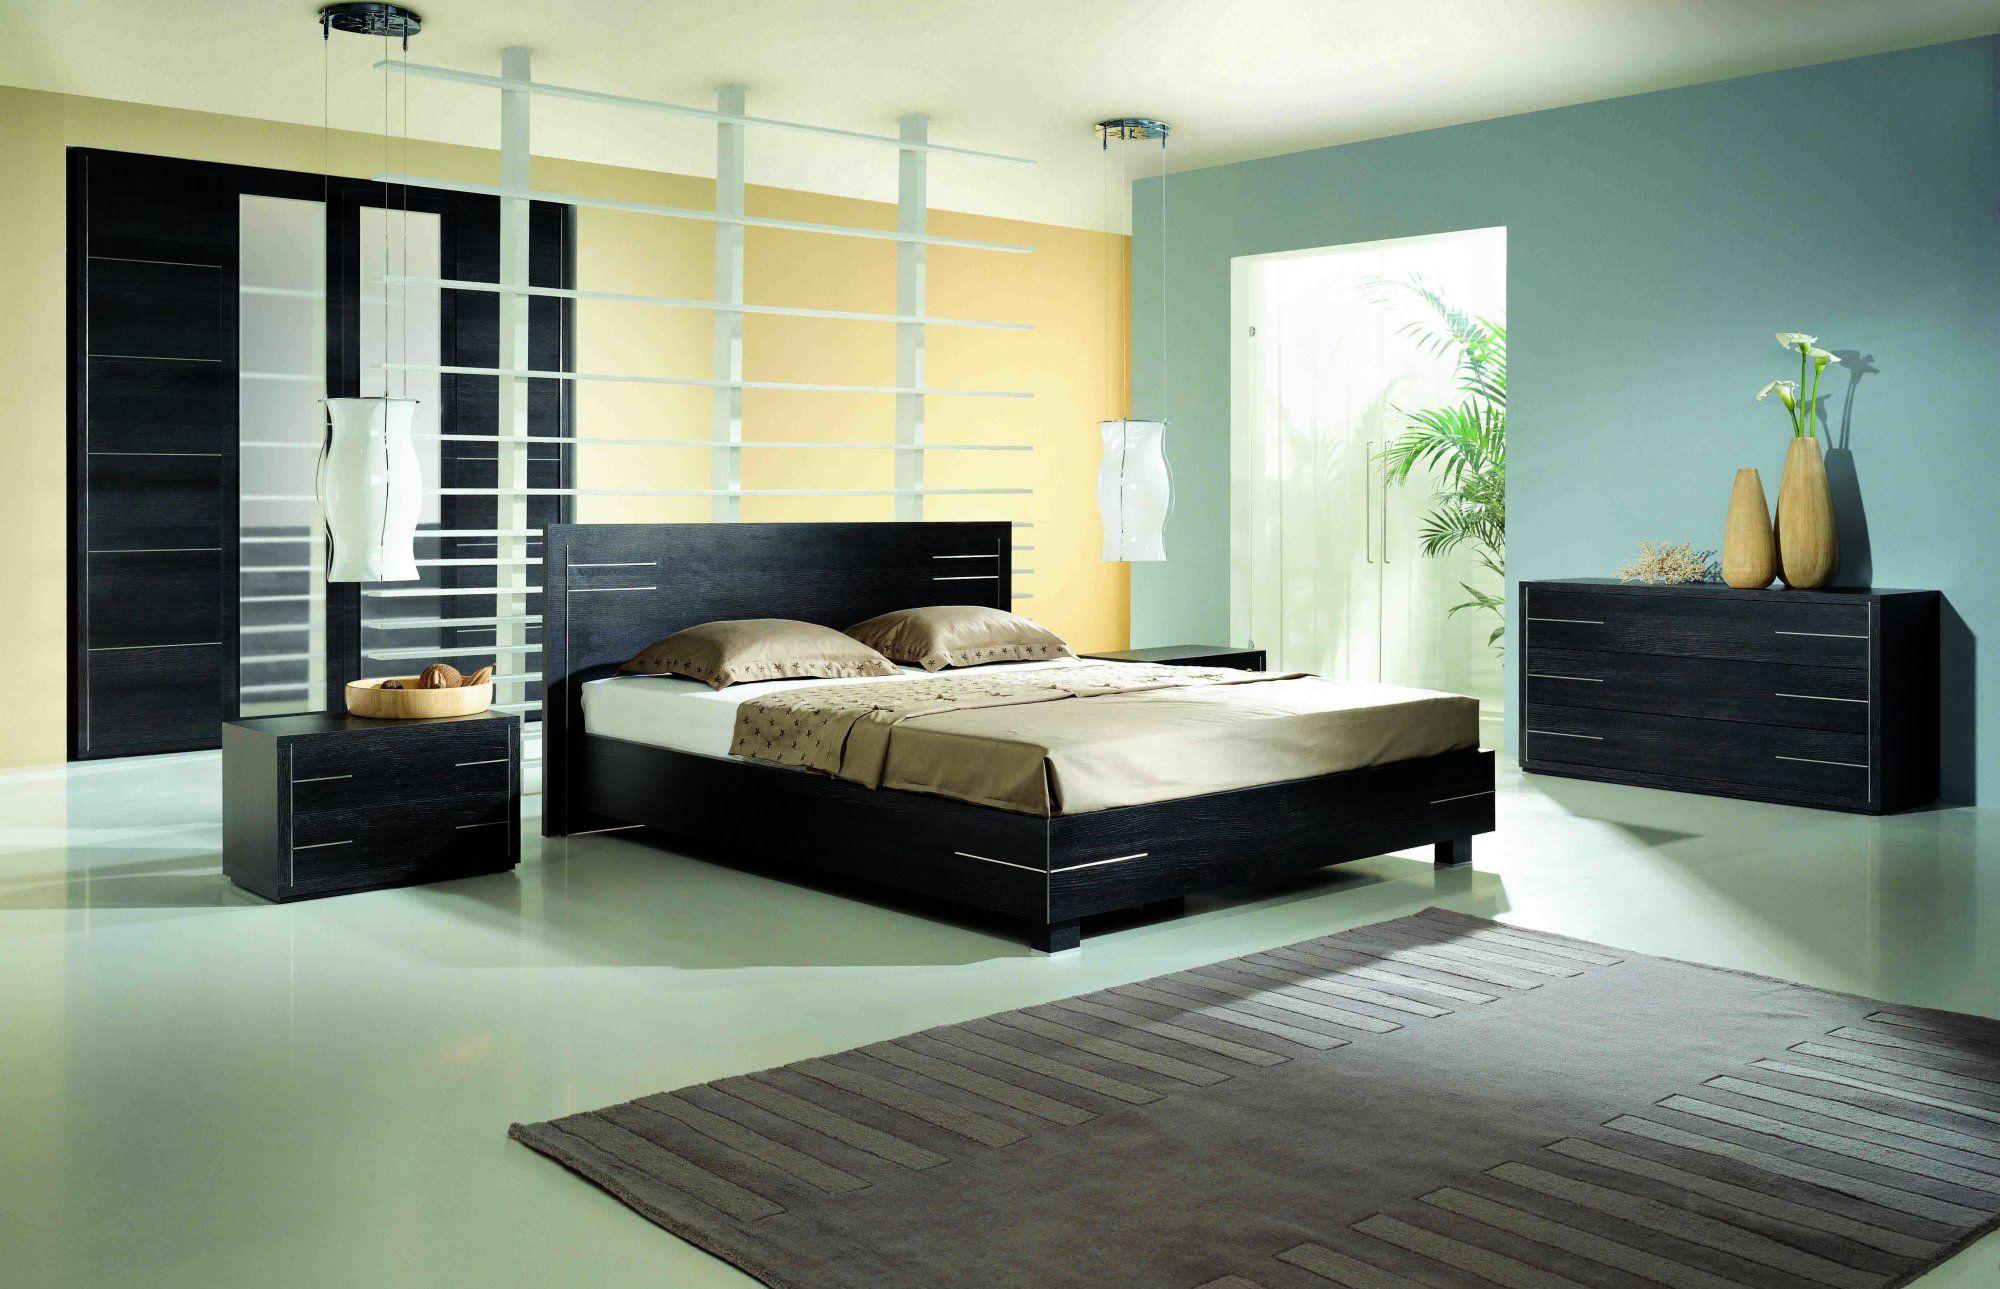 Interior Renovation Contractors Manhattan Provides The Best Services In Manhattan Http Goo Gl Dzvgg Remodel Bedroom Bedroom Interior Best Bedroom Colors